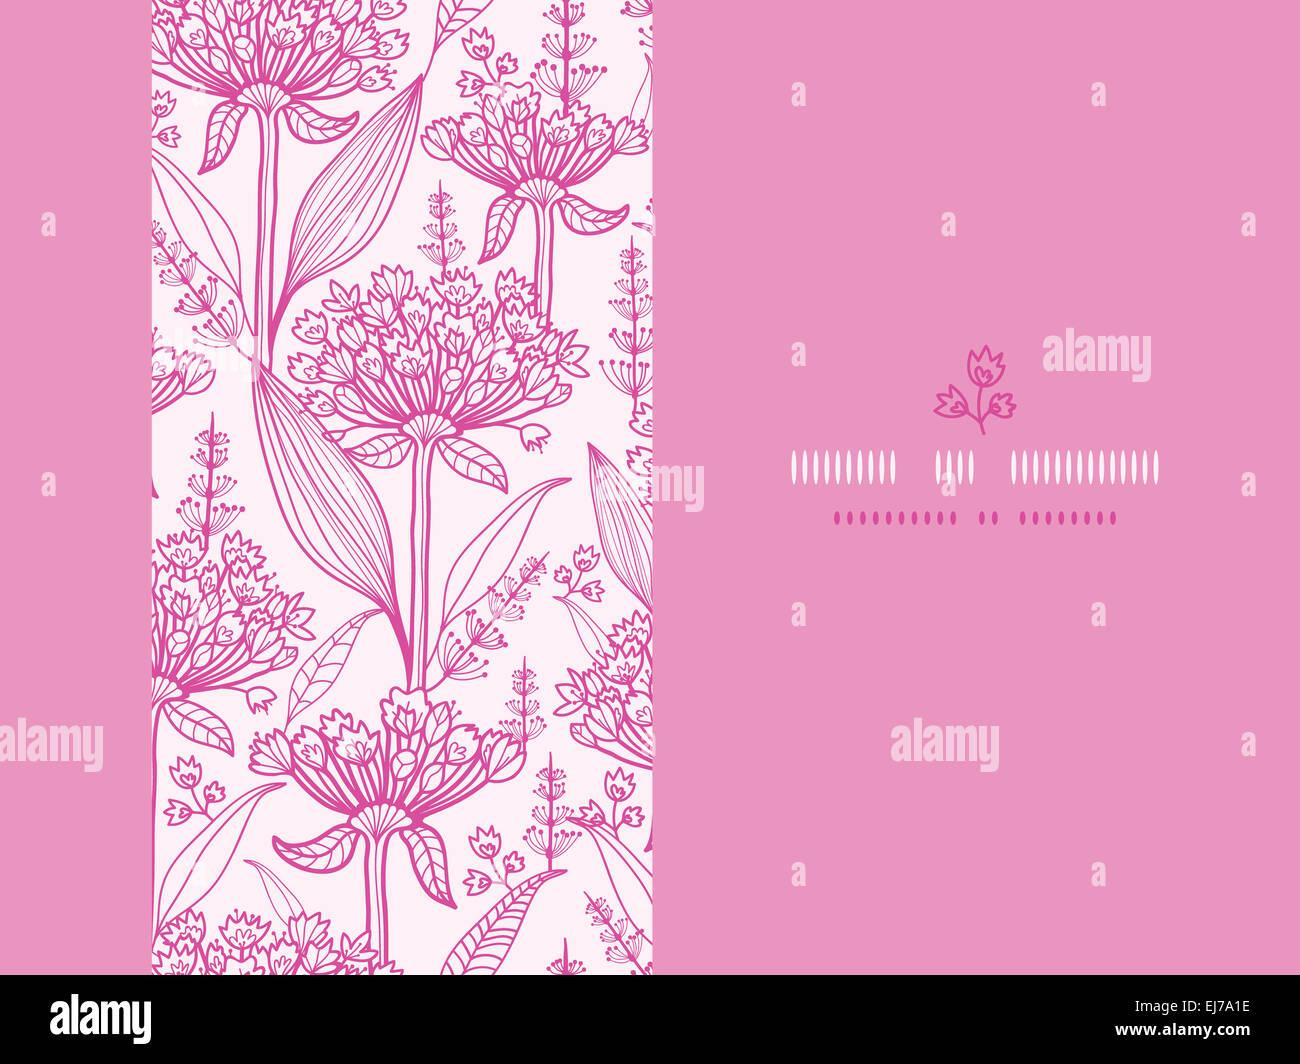 Horizontal Line Art : Pink lillies lineart horizontal seamless pattern background stock